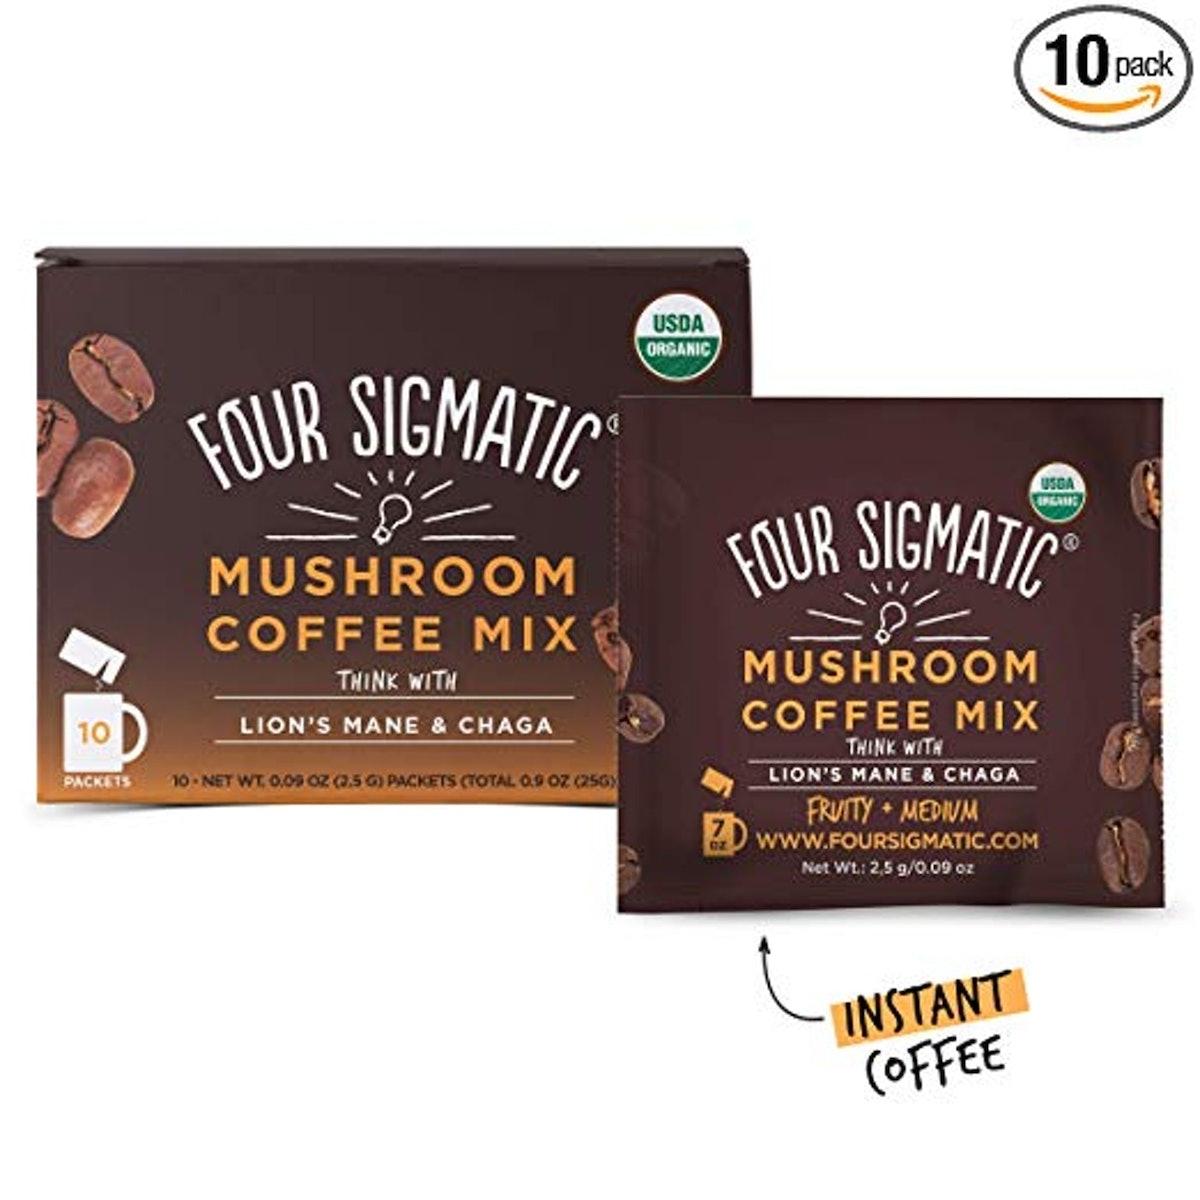 Four Sigma Foods Mushroom Coffee With Lion's Mane And Chaga